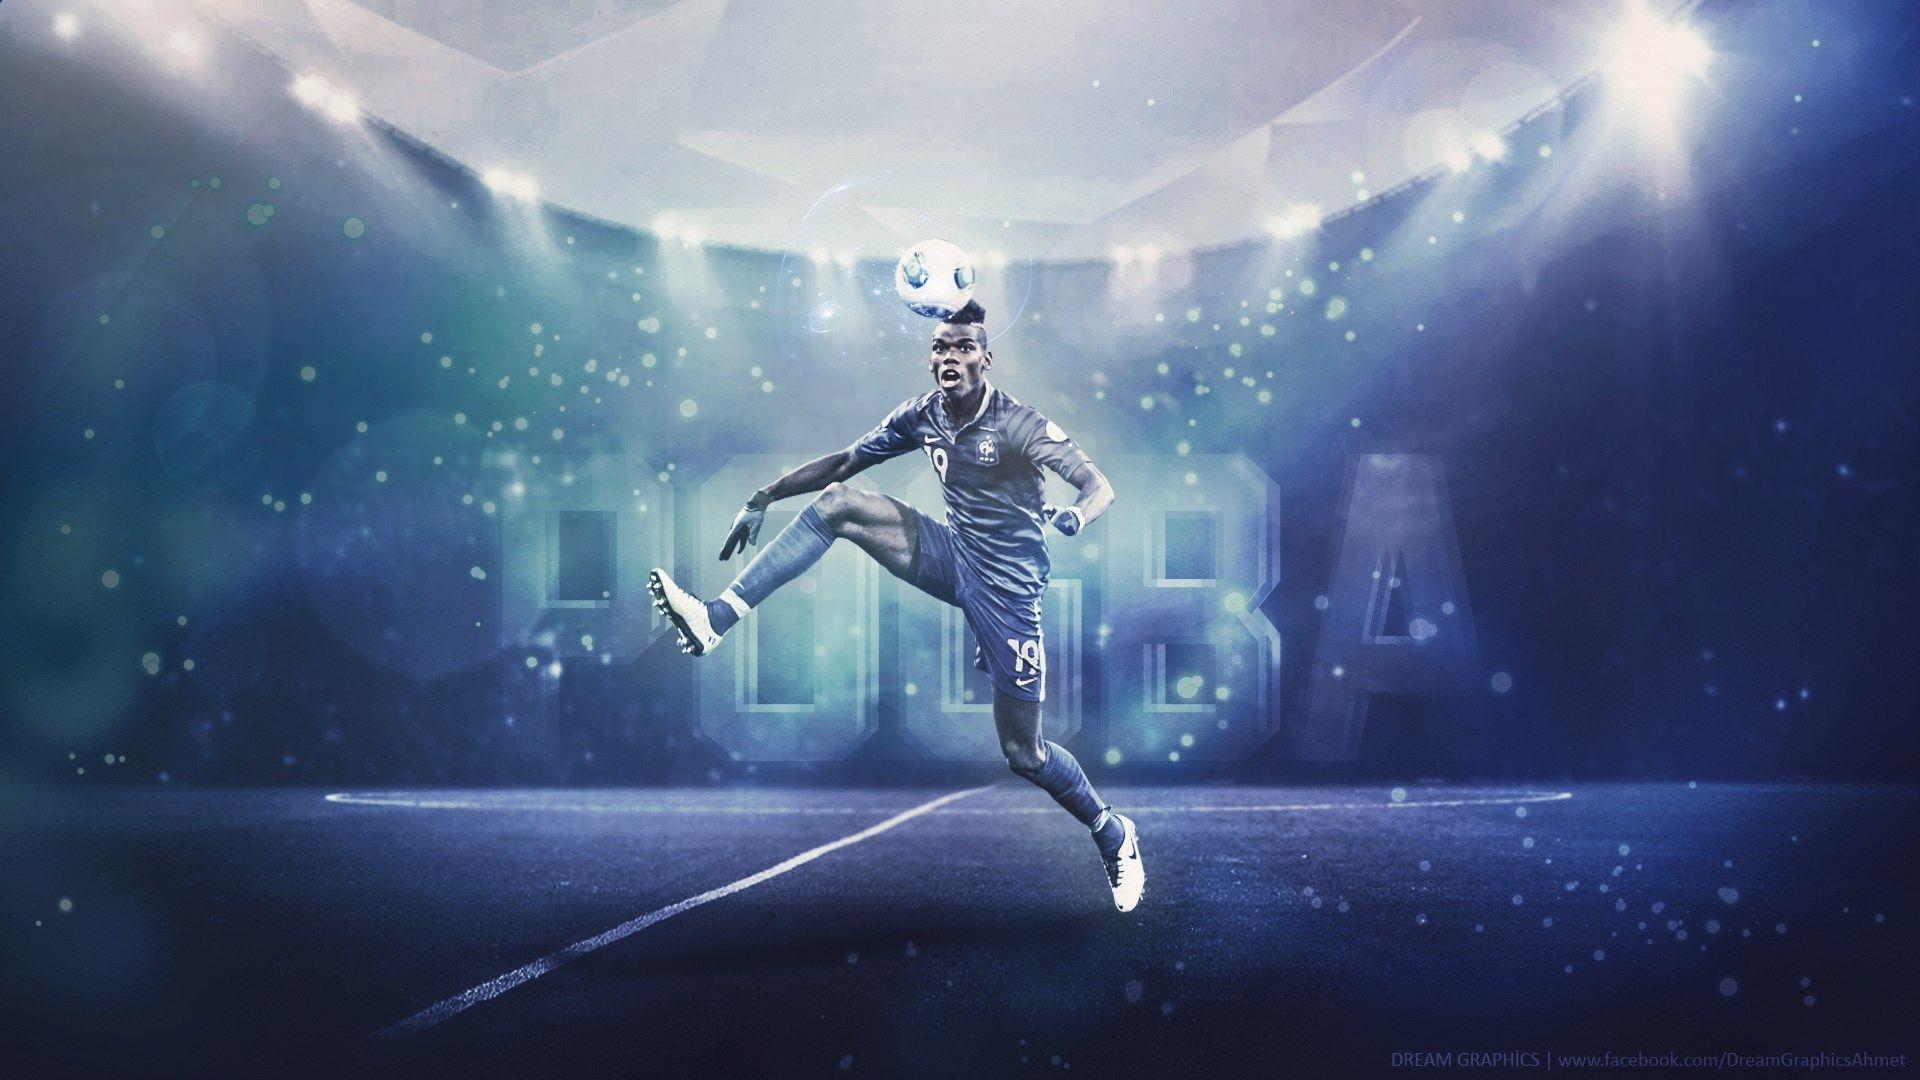 Paul-Pogba-Juventus-Football-Wallpapers-HD.jpeg (1920×1080)